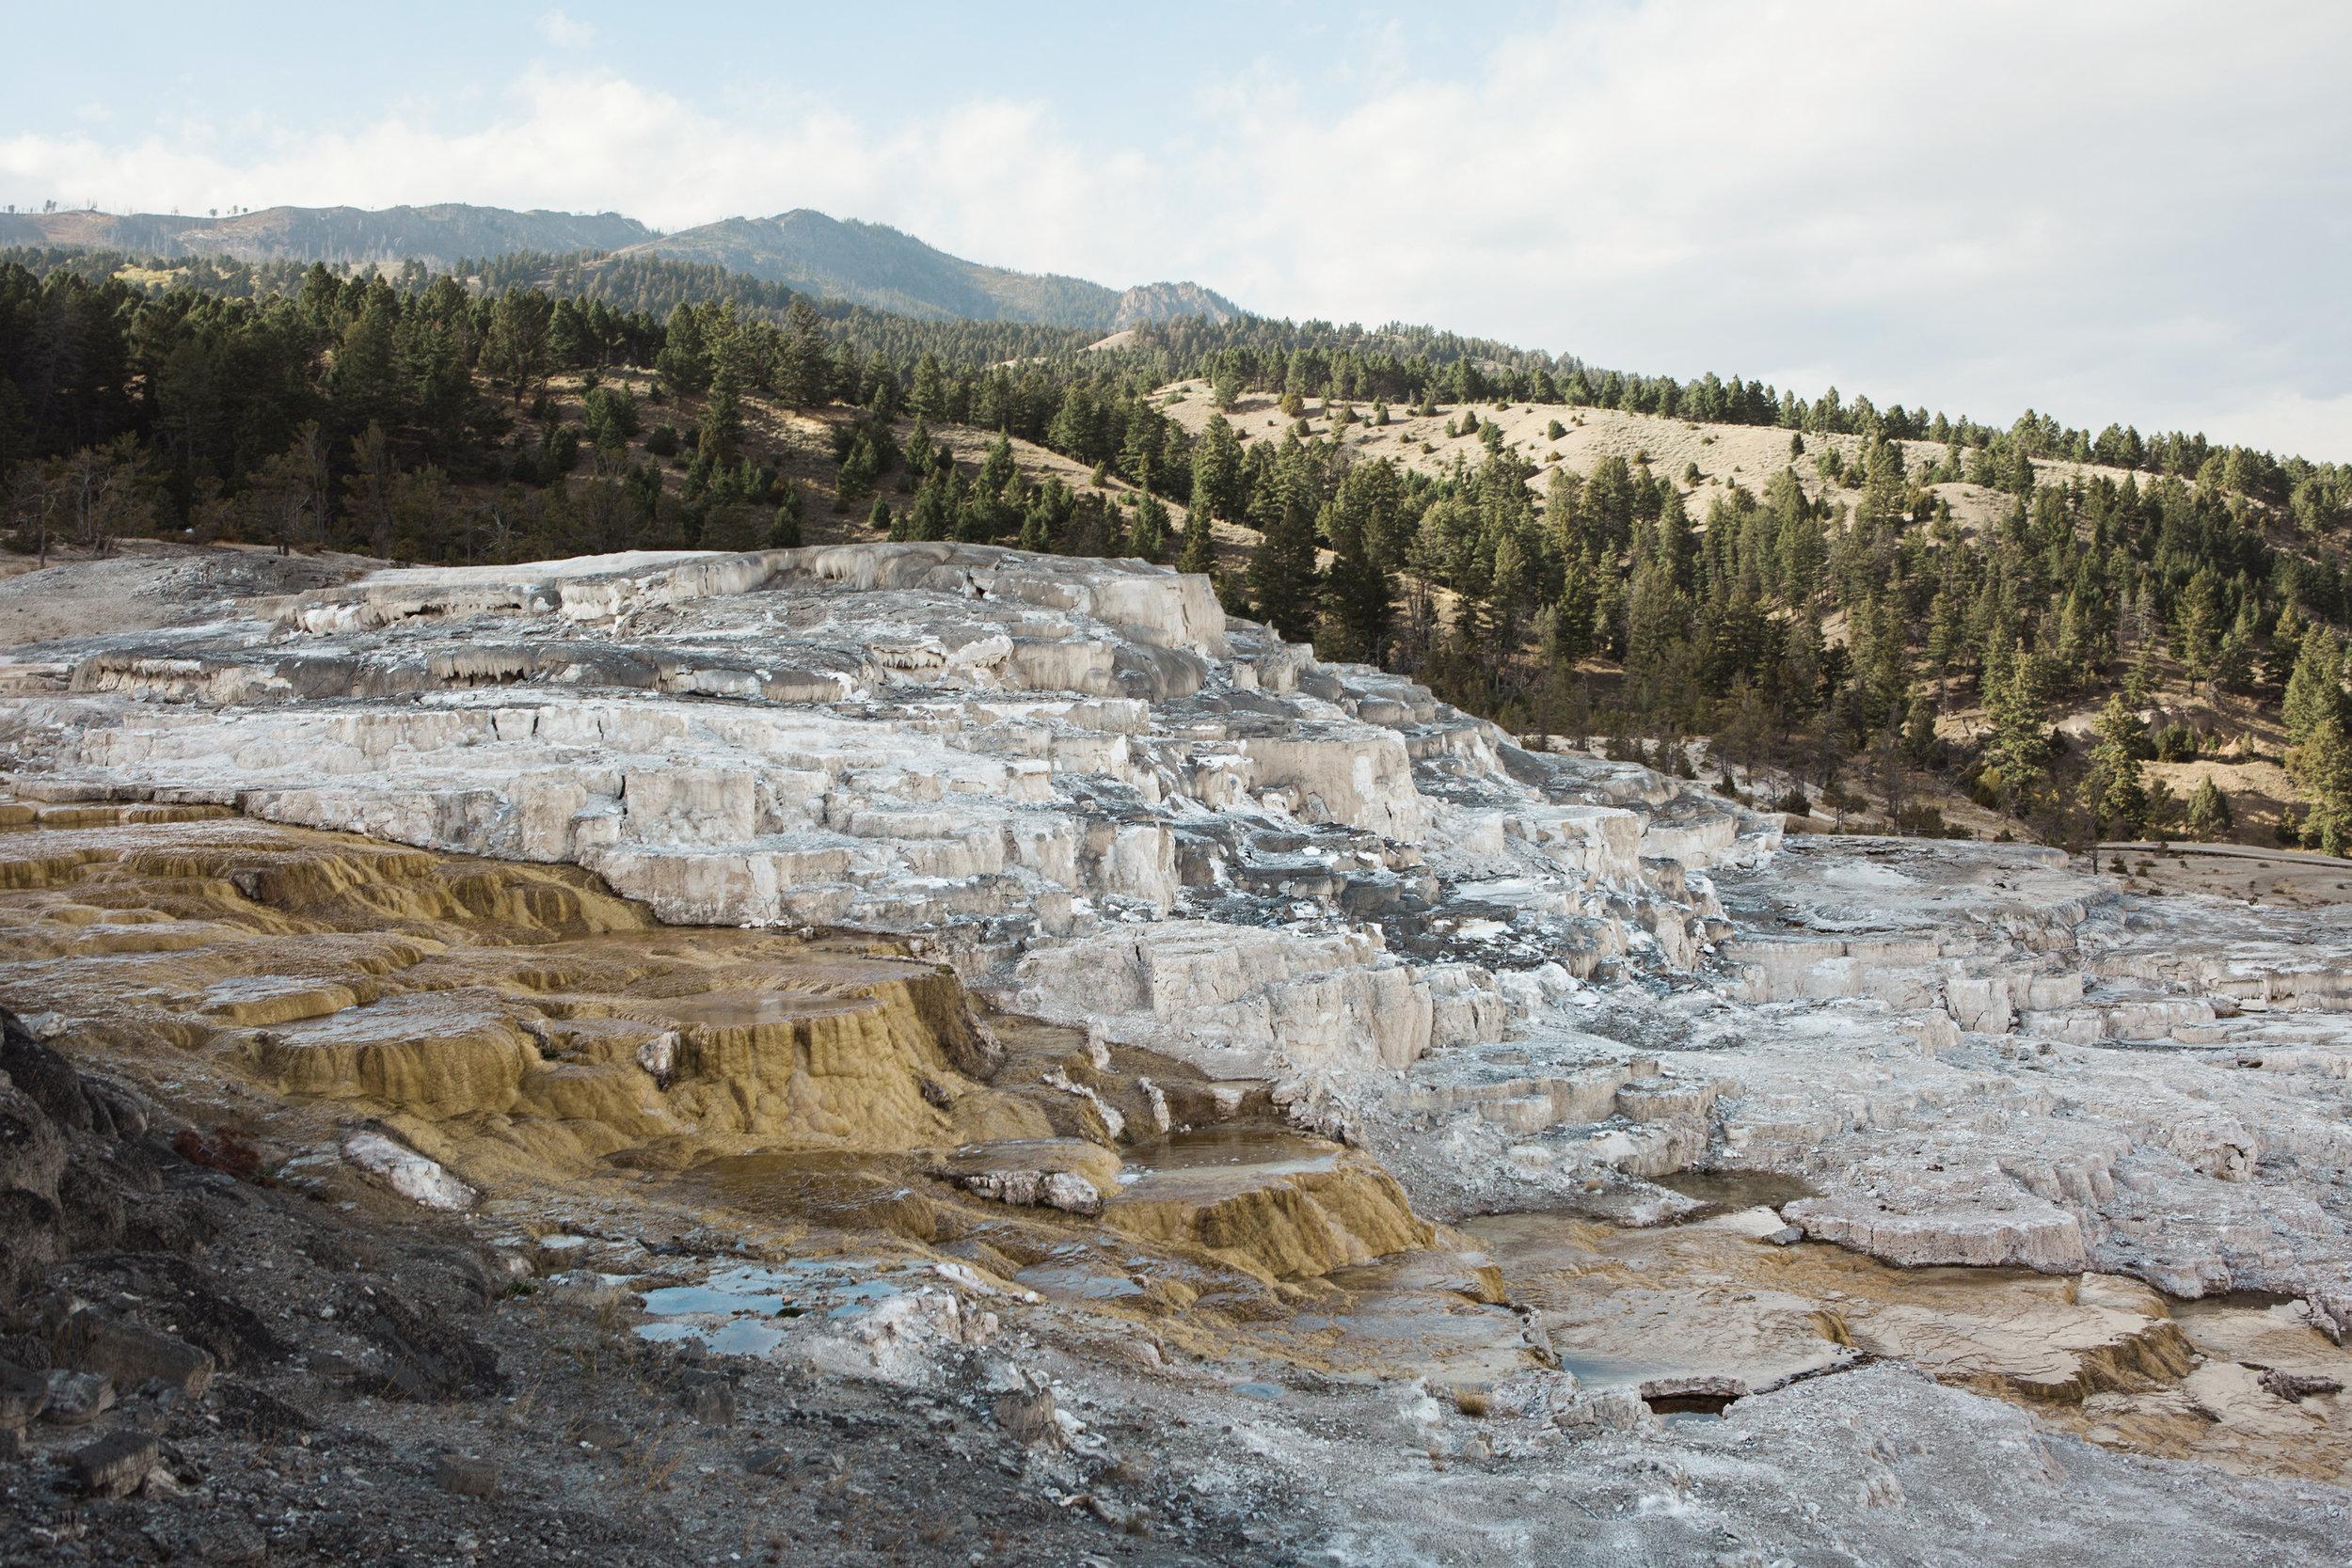 CindyGiovagnoli_Yellowstone_National_Park_Montana_Wyoming_bison_pronghorn_snow_elk_truckcamping-003.jpg